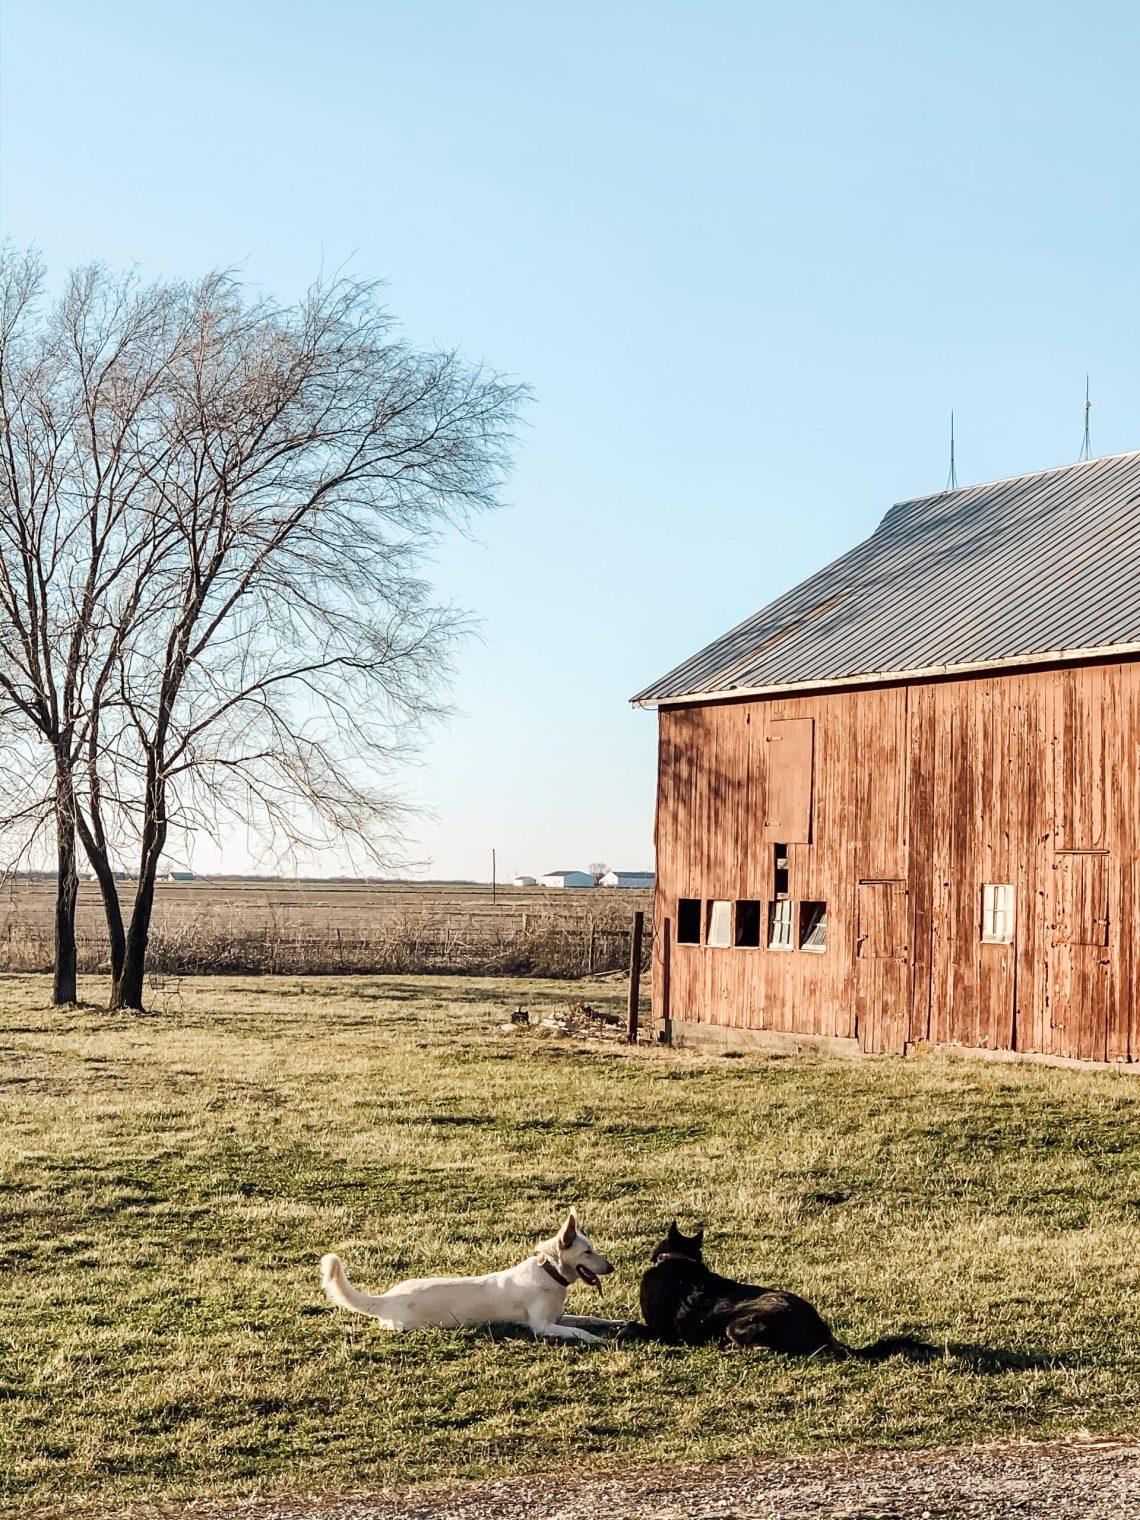 This Week at the Farm: 1